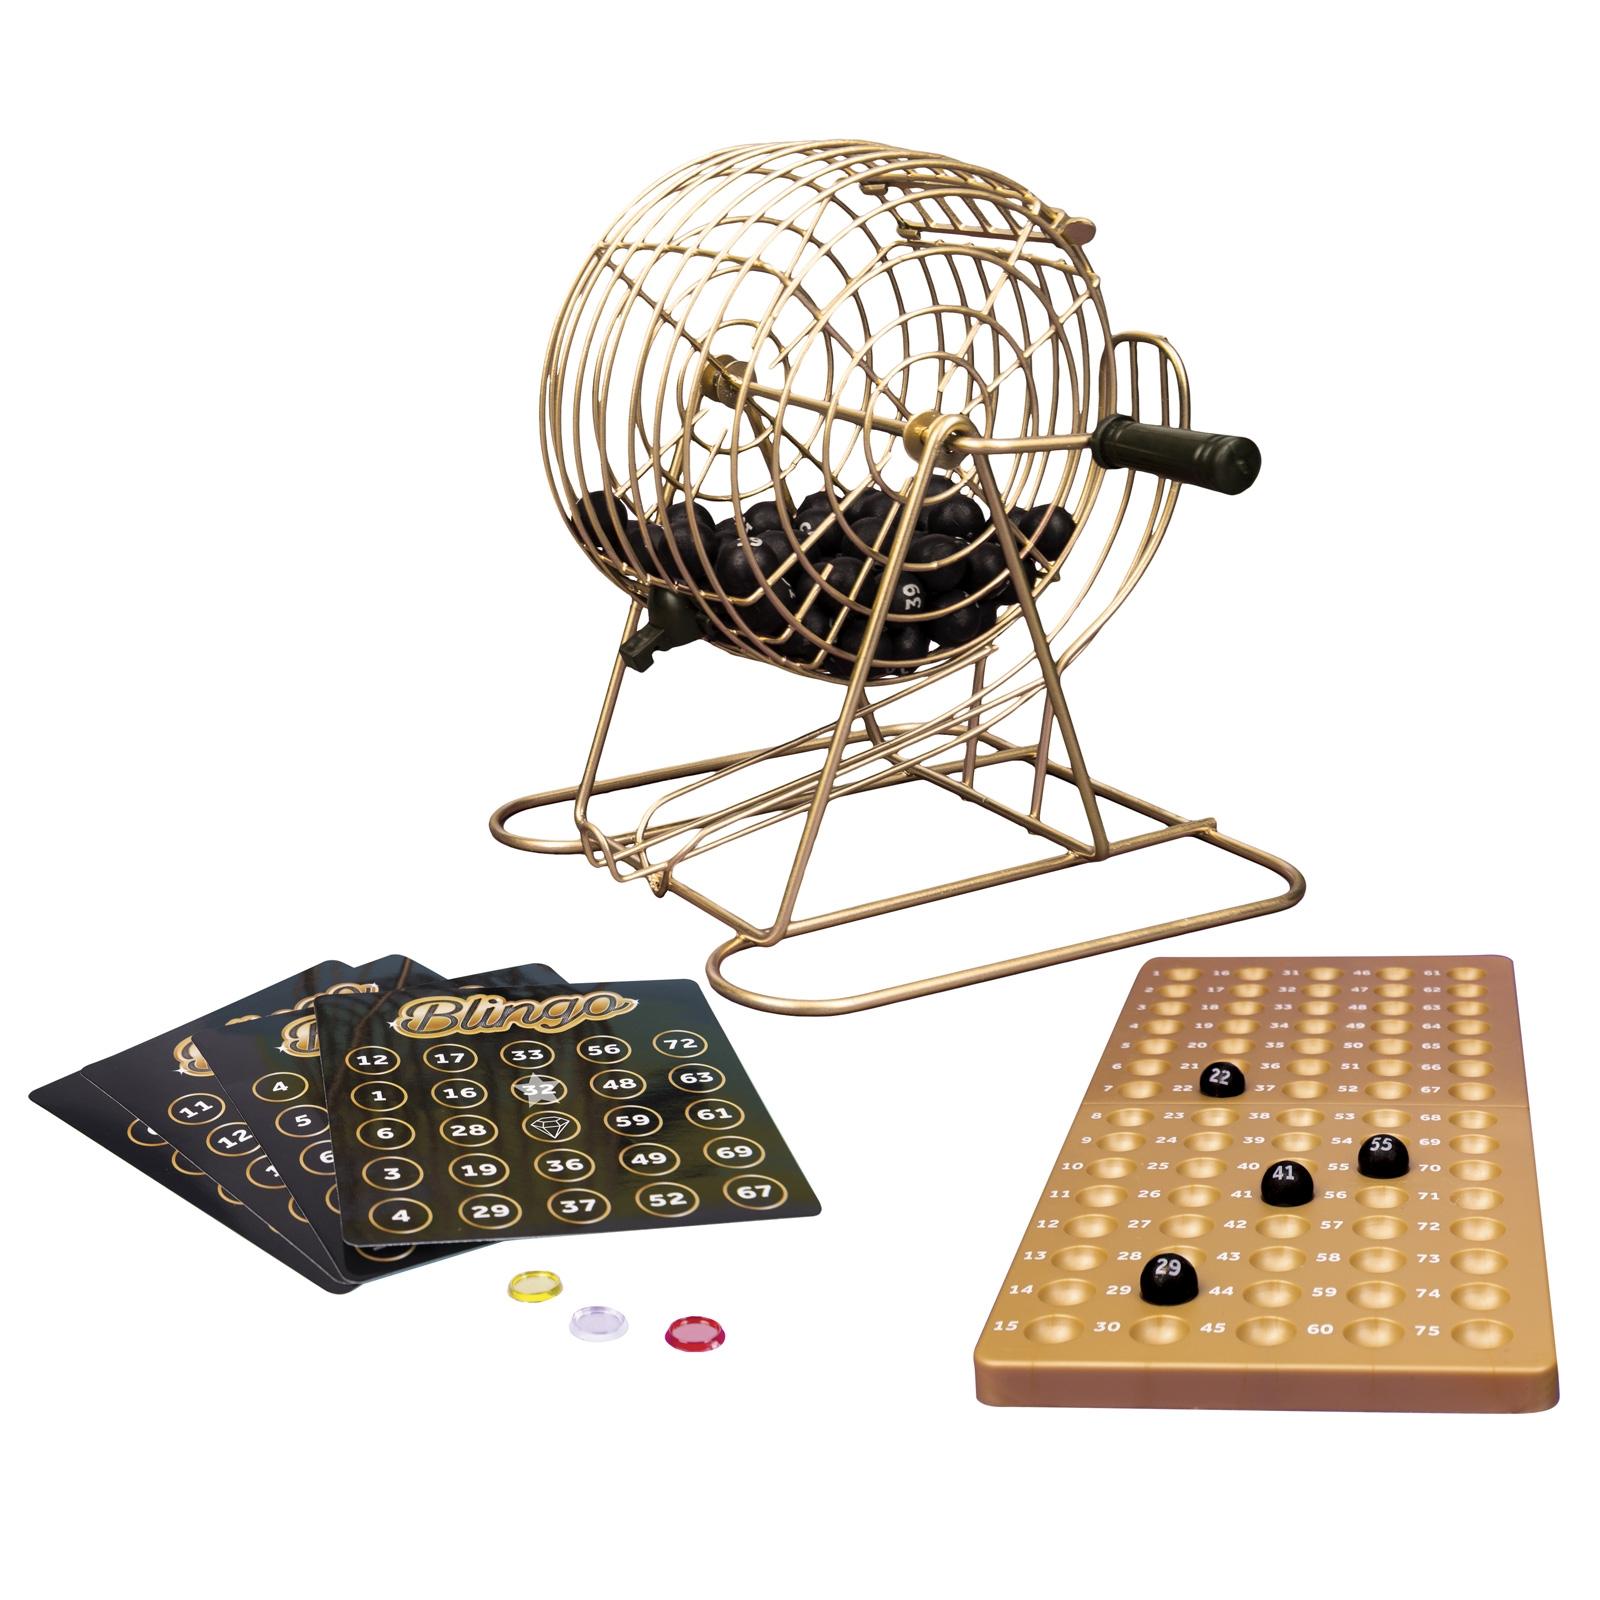 Blingo Bingo Game